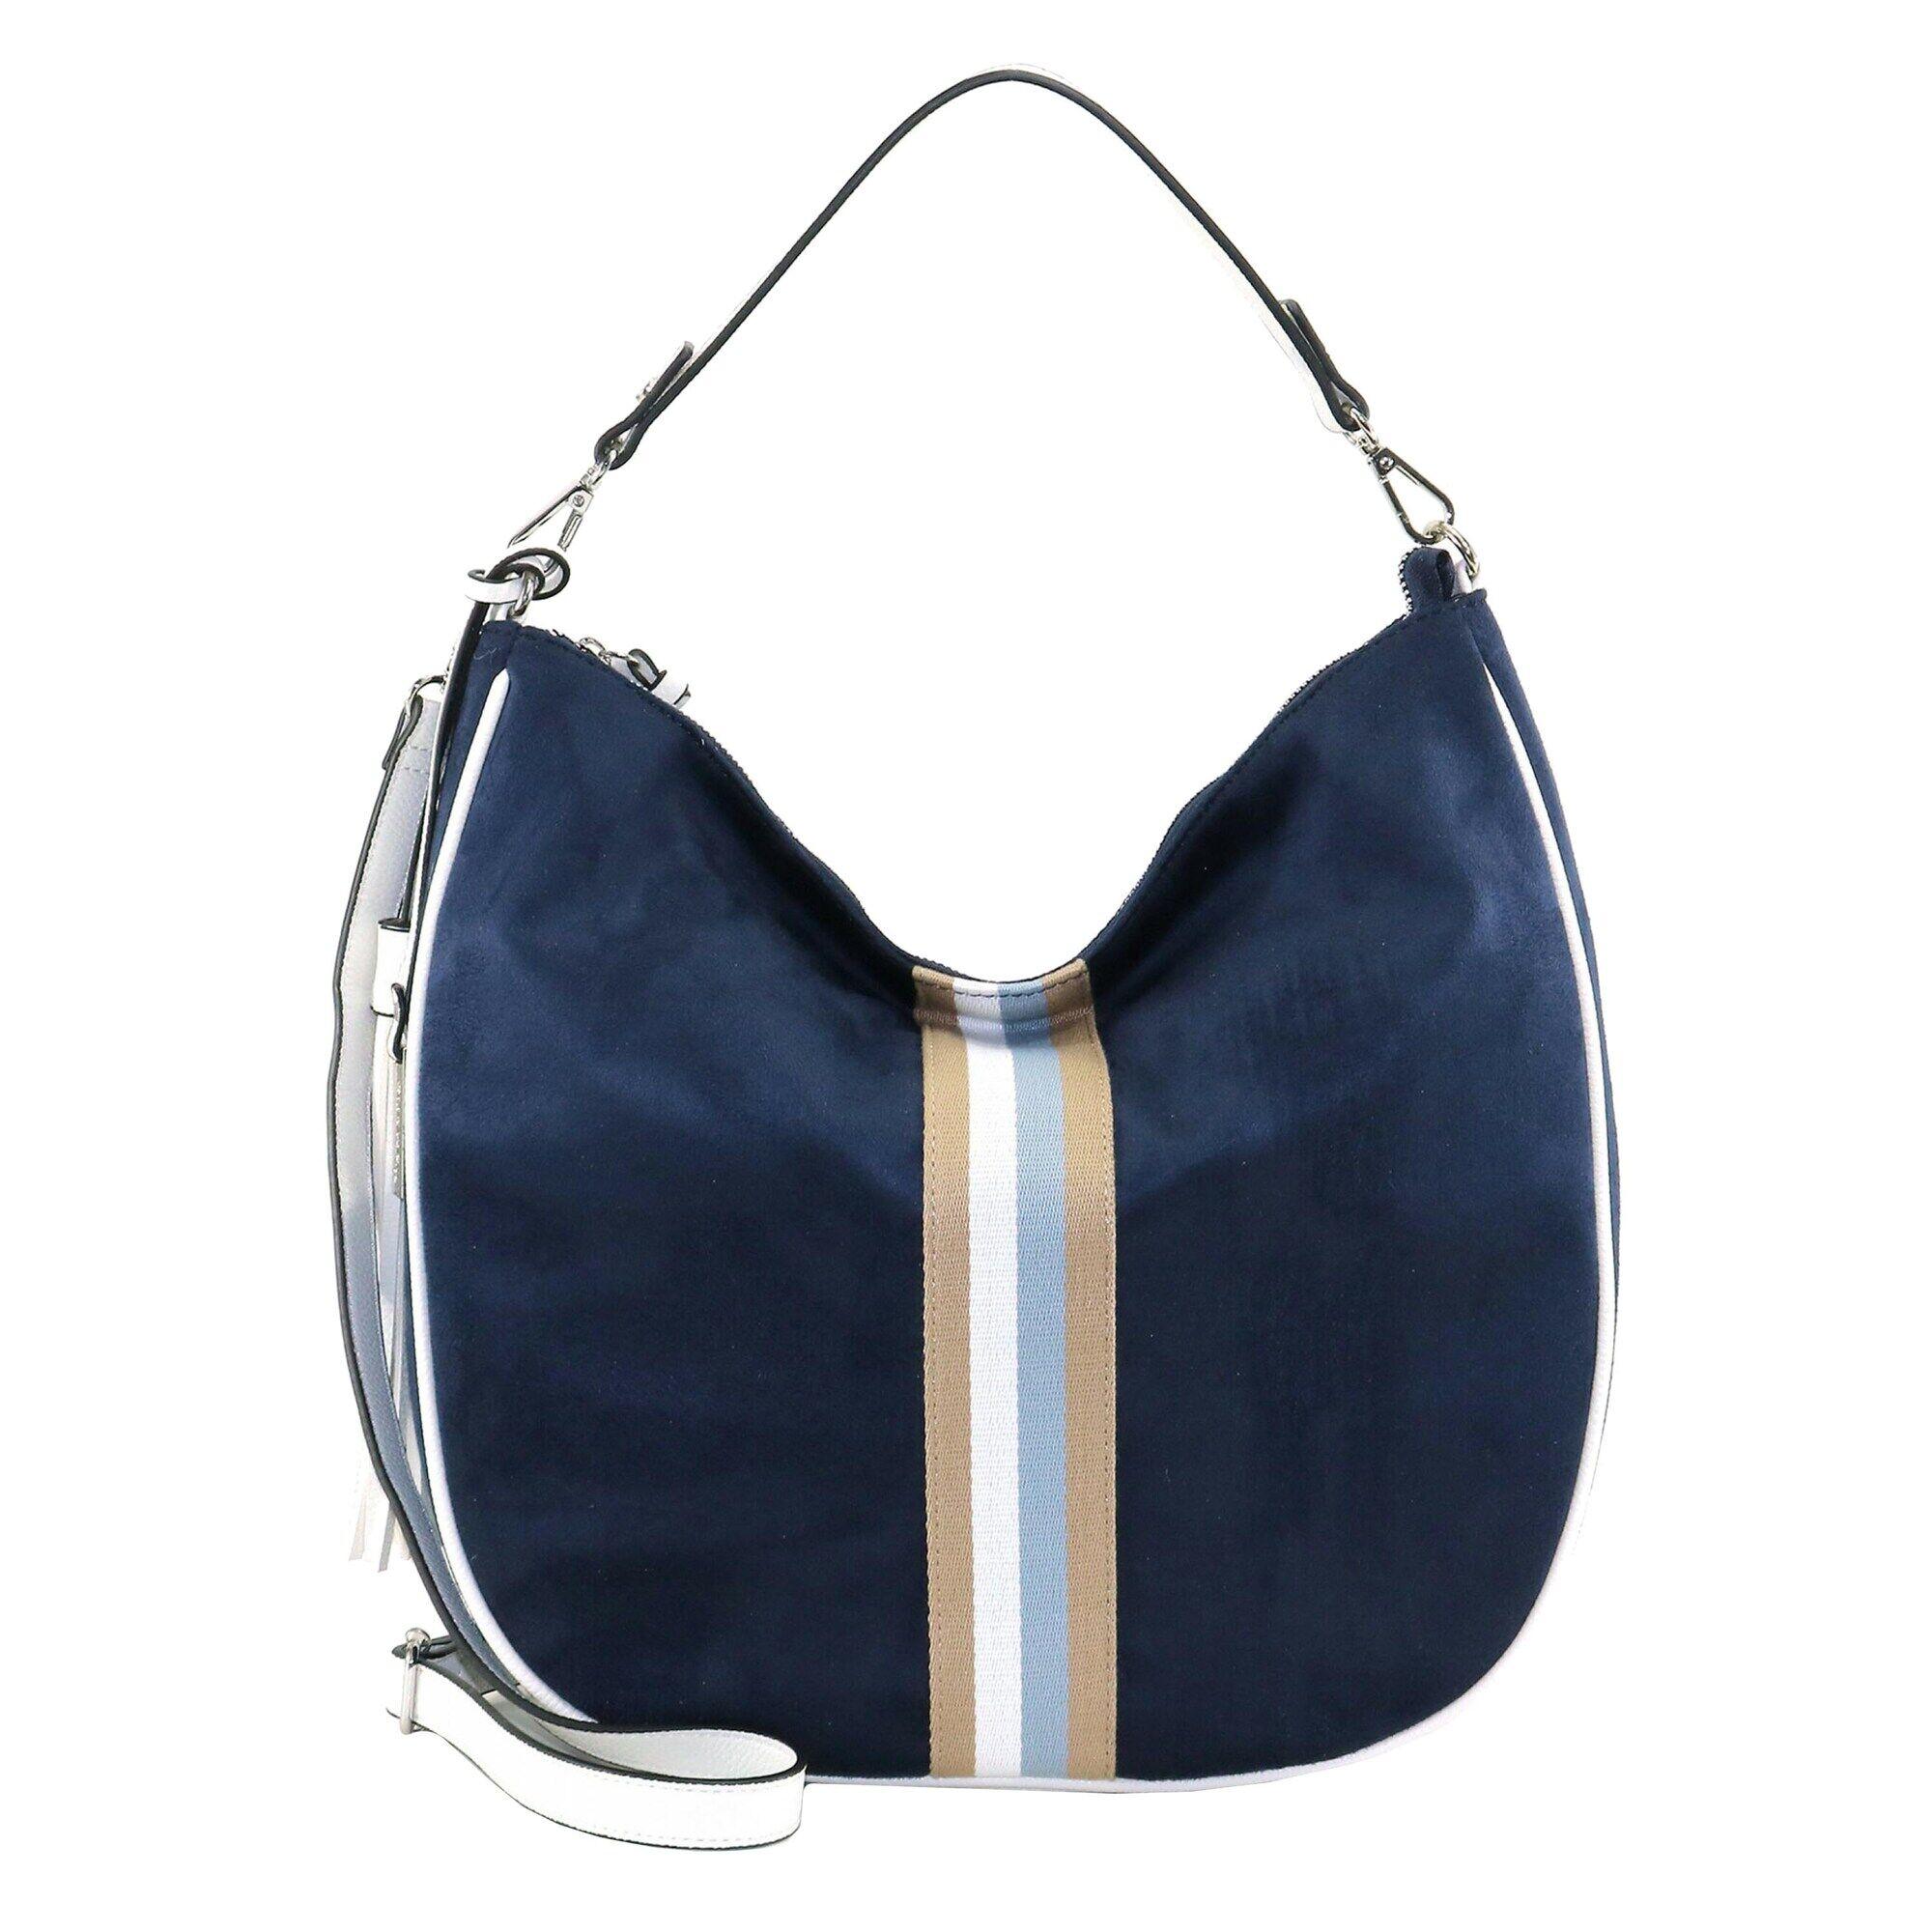 TAMARIS Sacs à main 'Cora'  - Bleu - Taille: One Size - female